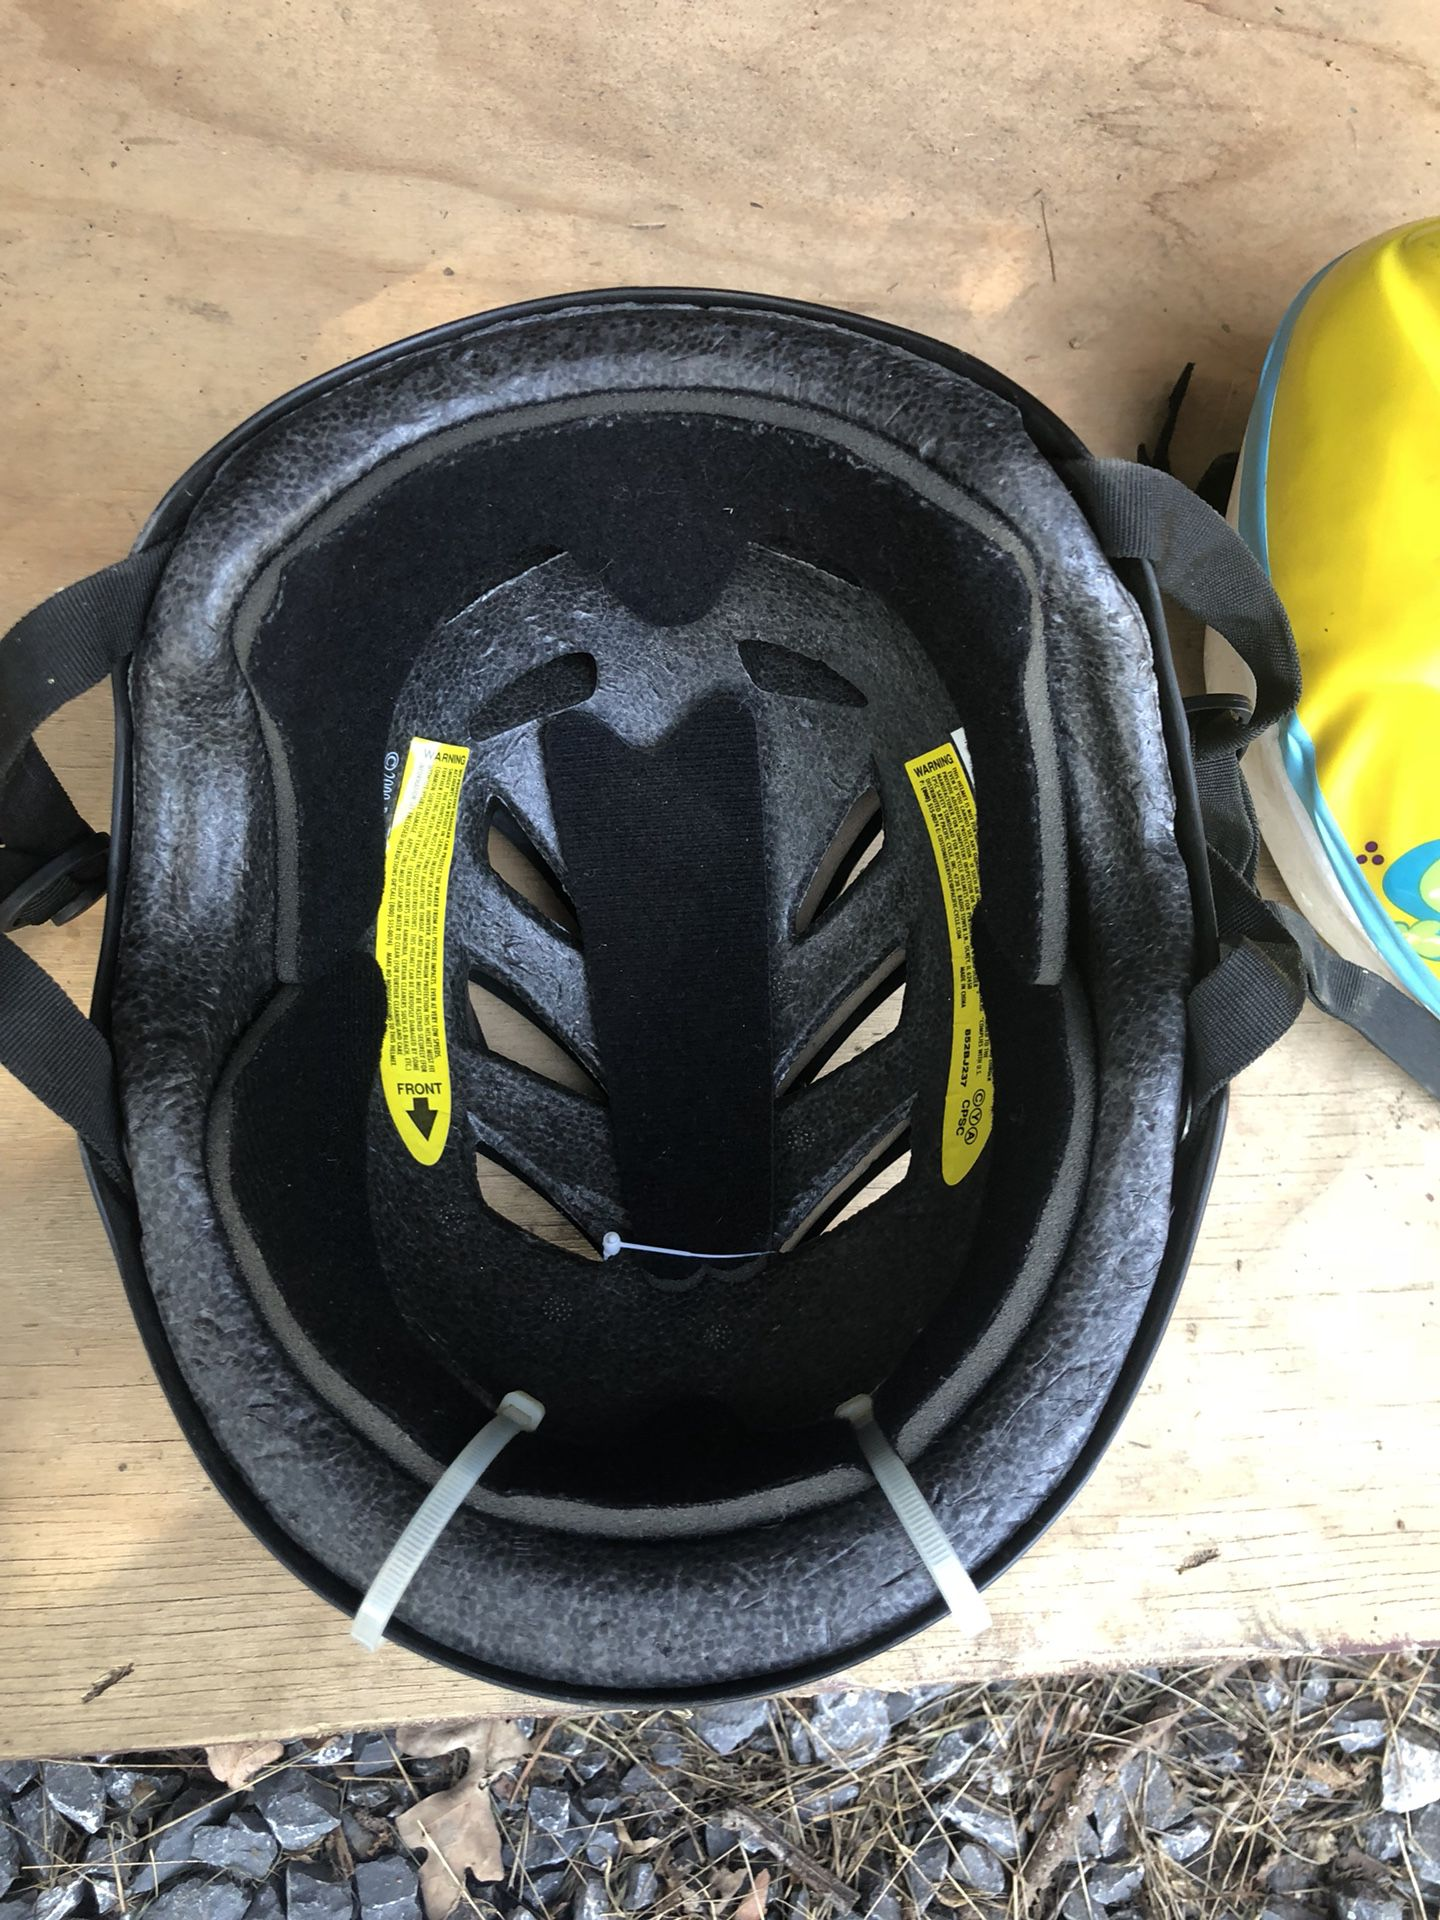 Mongoose helmet